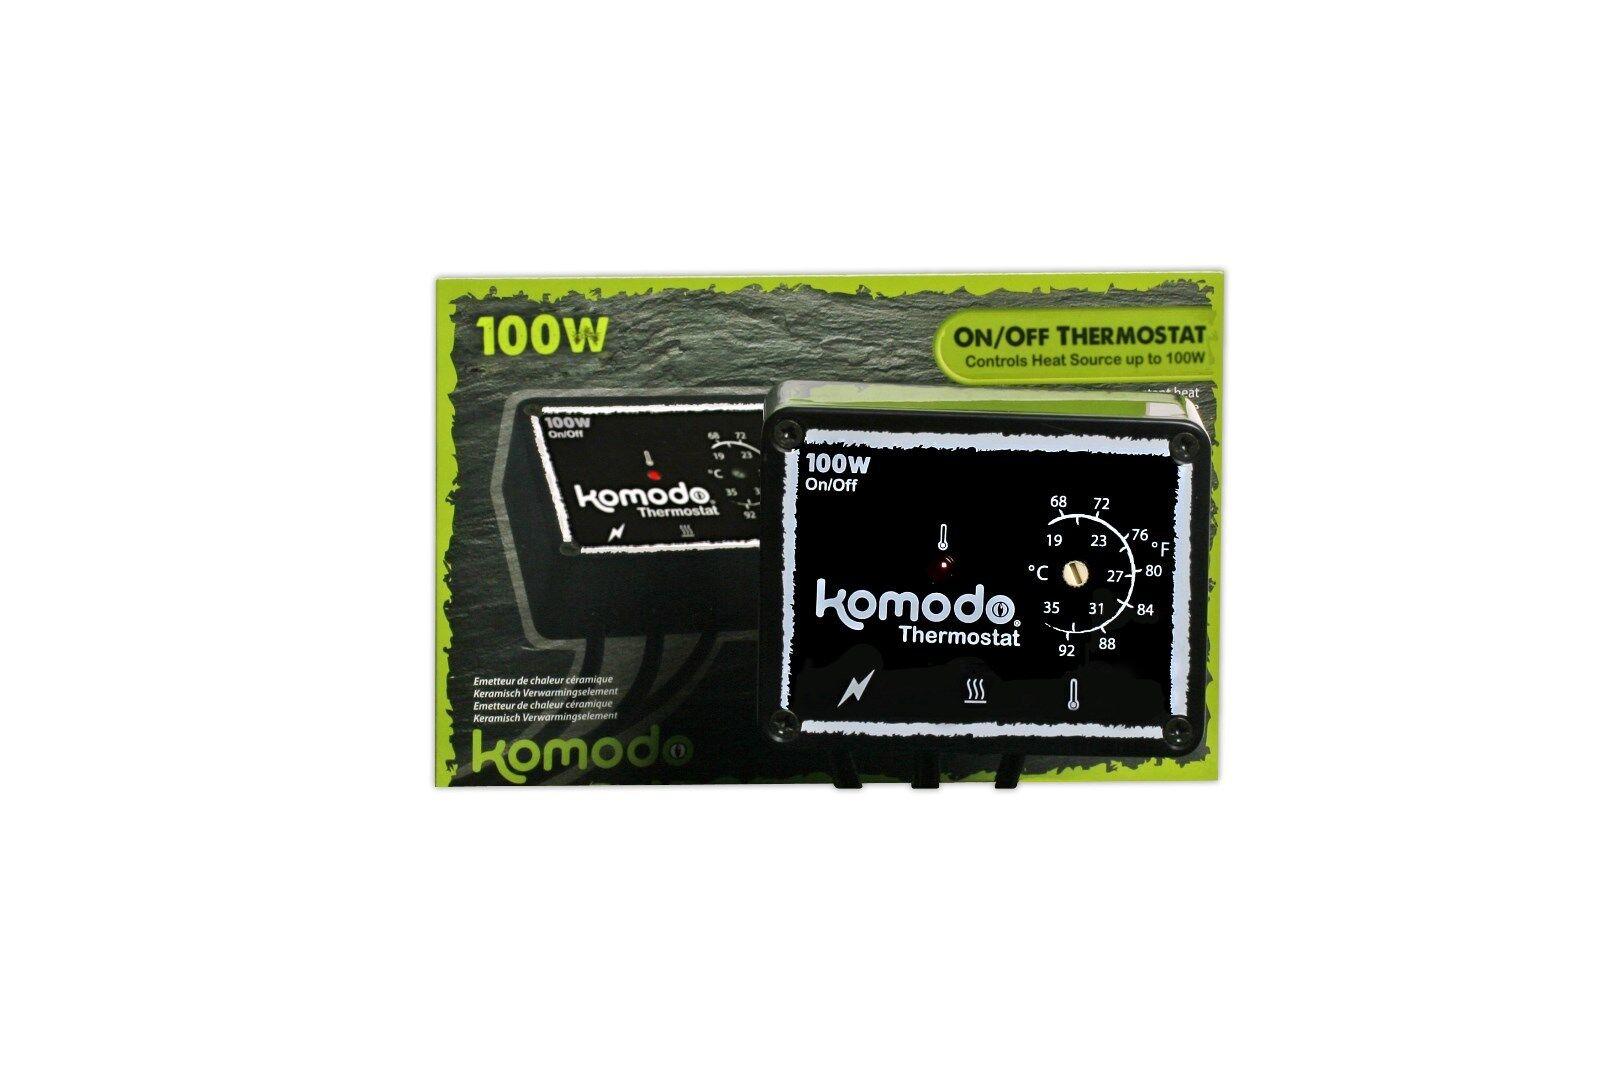 Komodo On   Off 100w Thermostat Matstat Ministat - ideal for heat mats